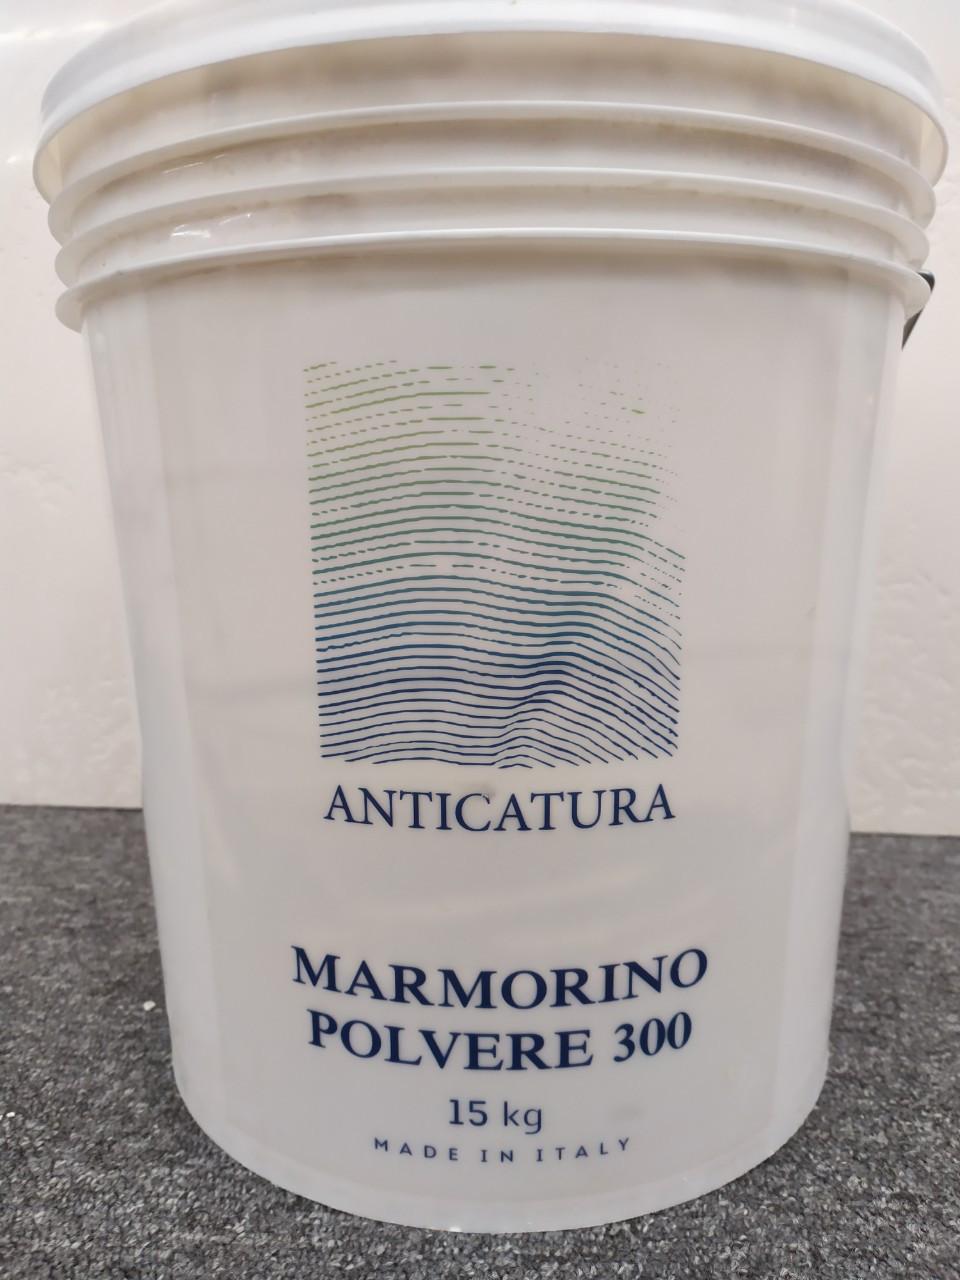 Готовая известковая штукатурка марморин ANTICATURA MARMORINO POLVERE 300 AQUA